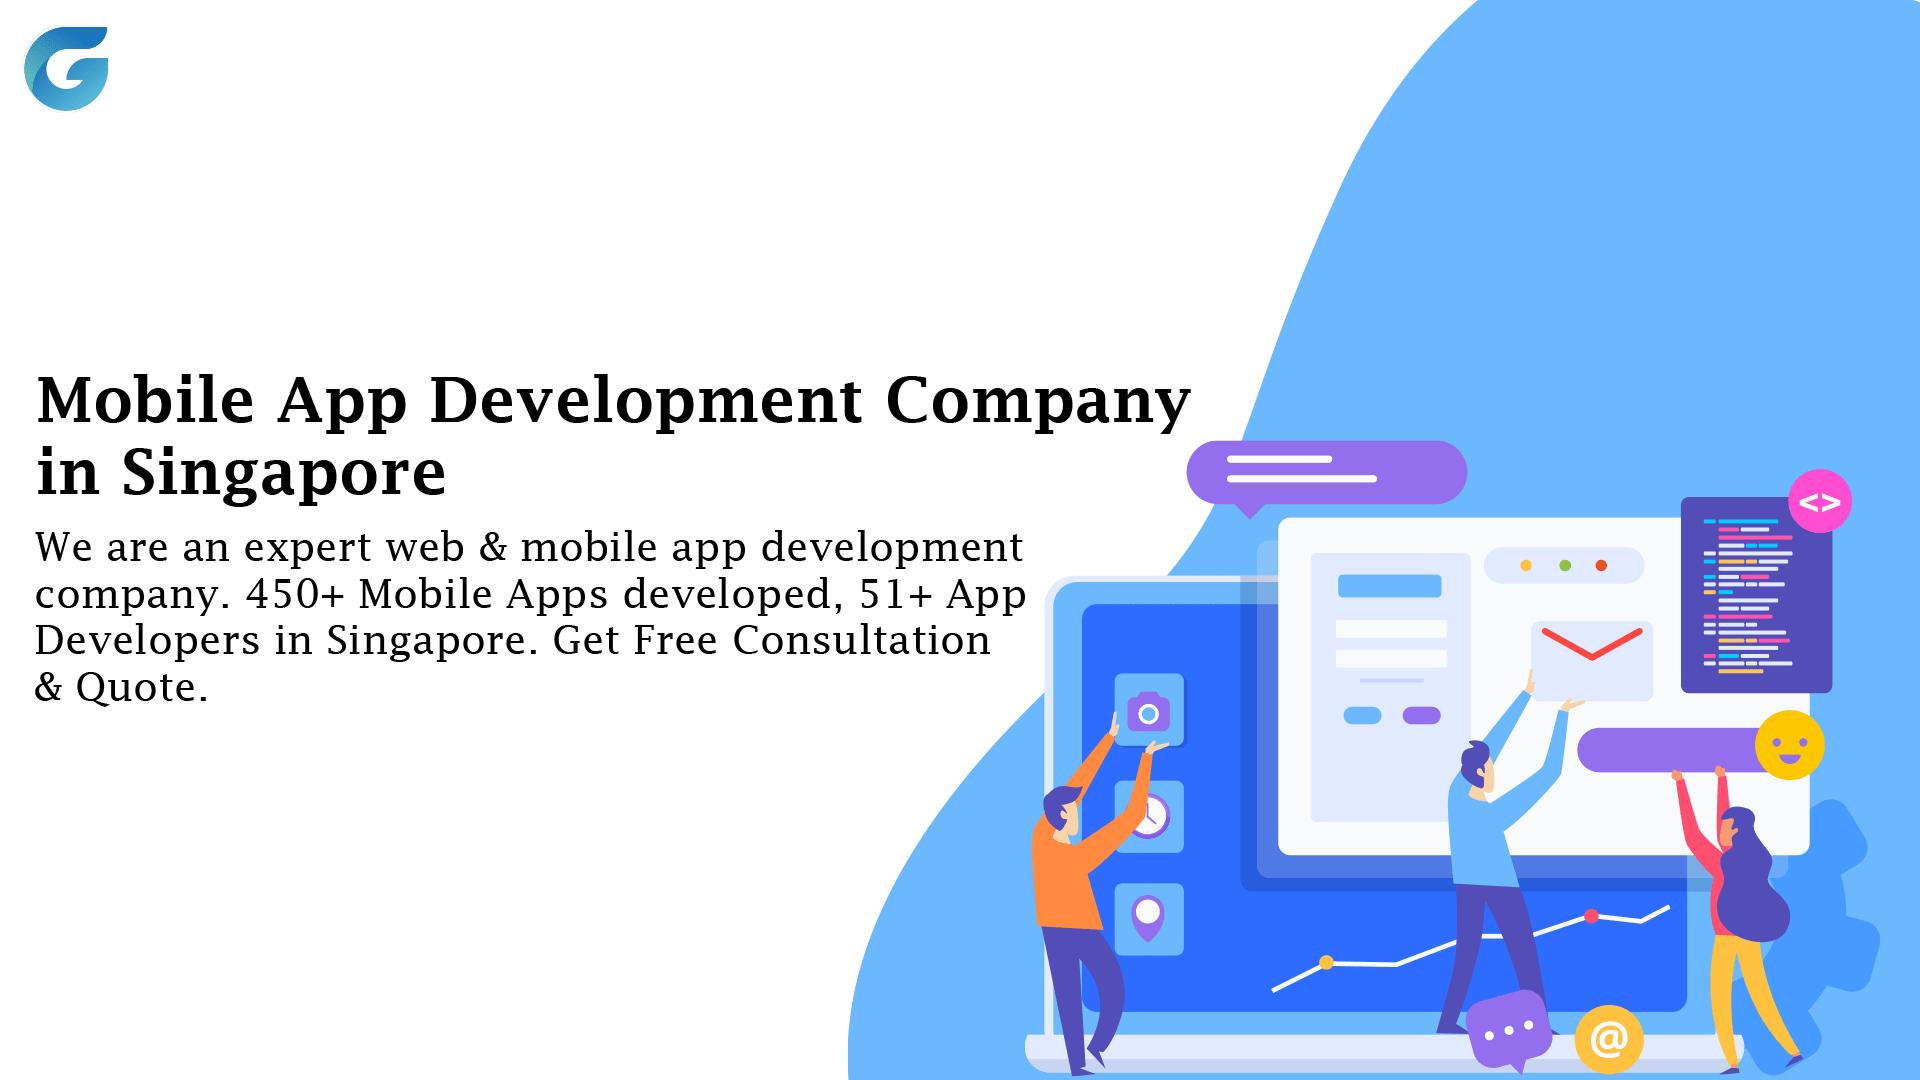 500+ Apps Developed | Mobile App Development Company Singapore